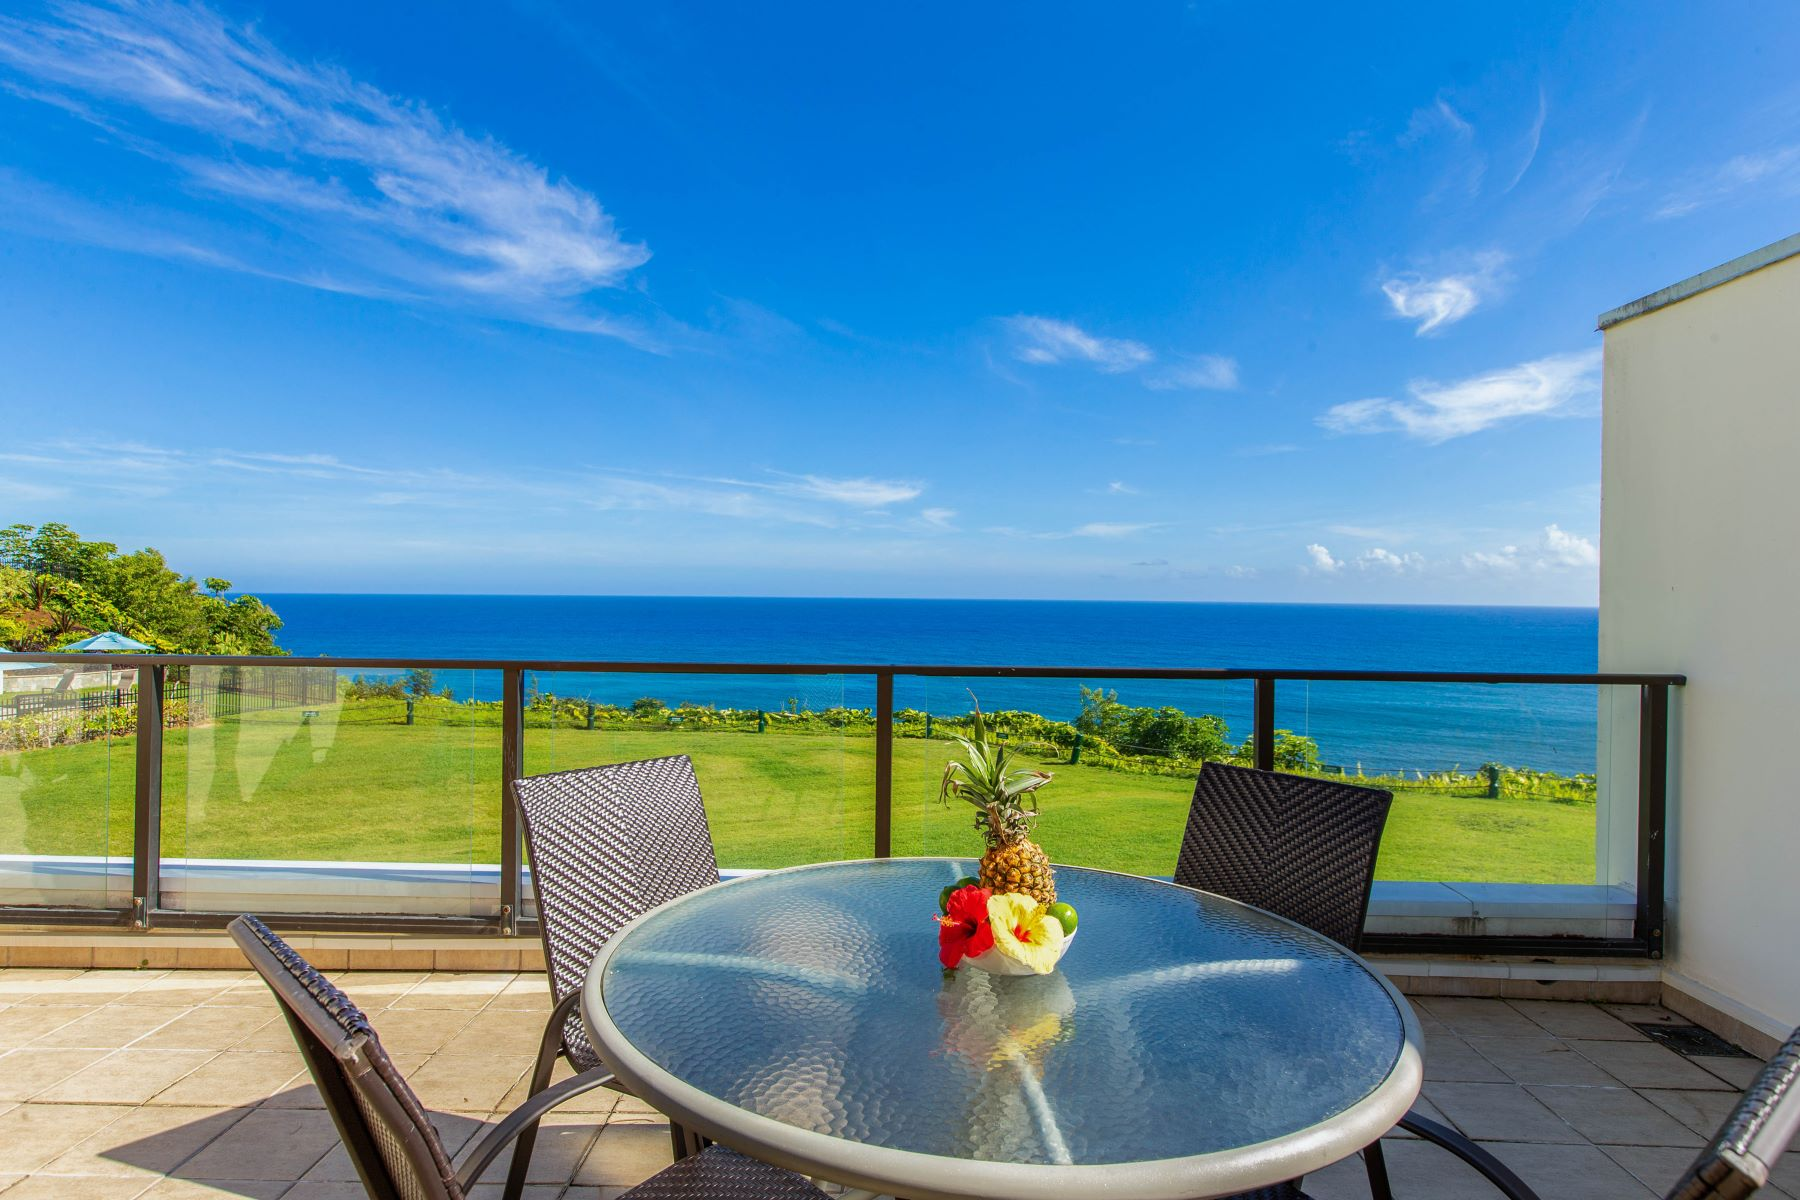 Condominiums for Sale at 5454 KA HAKU RD #203 PRINCEVILLE, HI 96722 5454 KA HAKU RD #203 Princeville, Hawaii 96722 United States